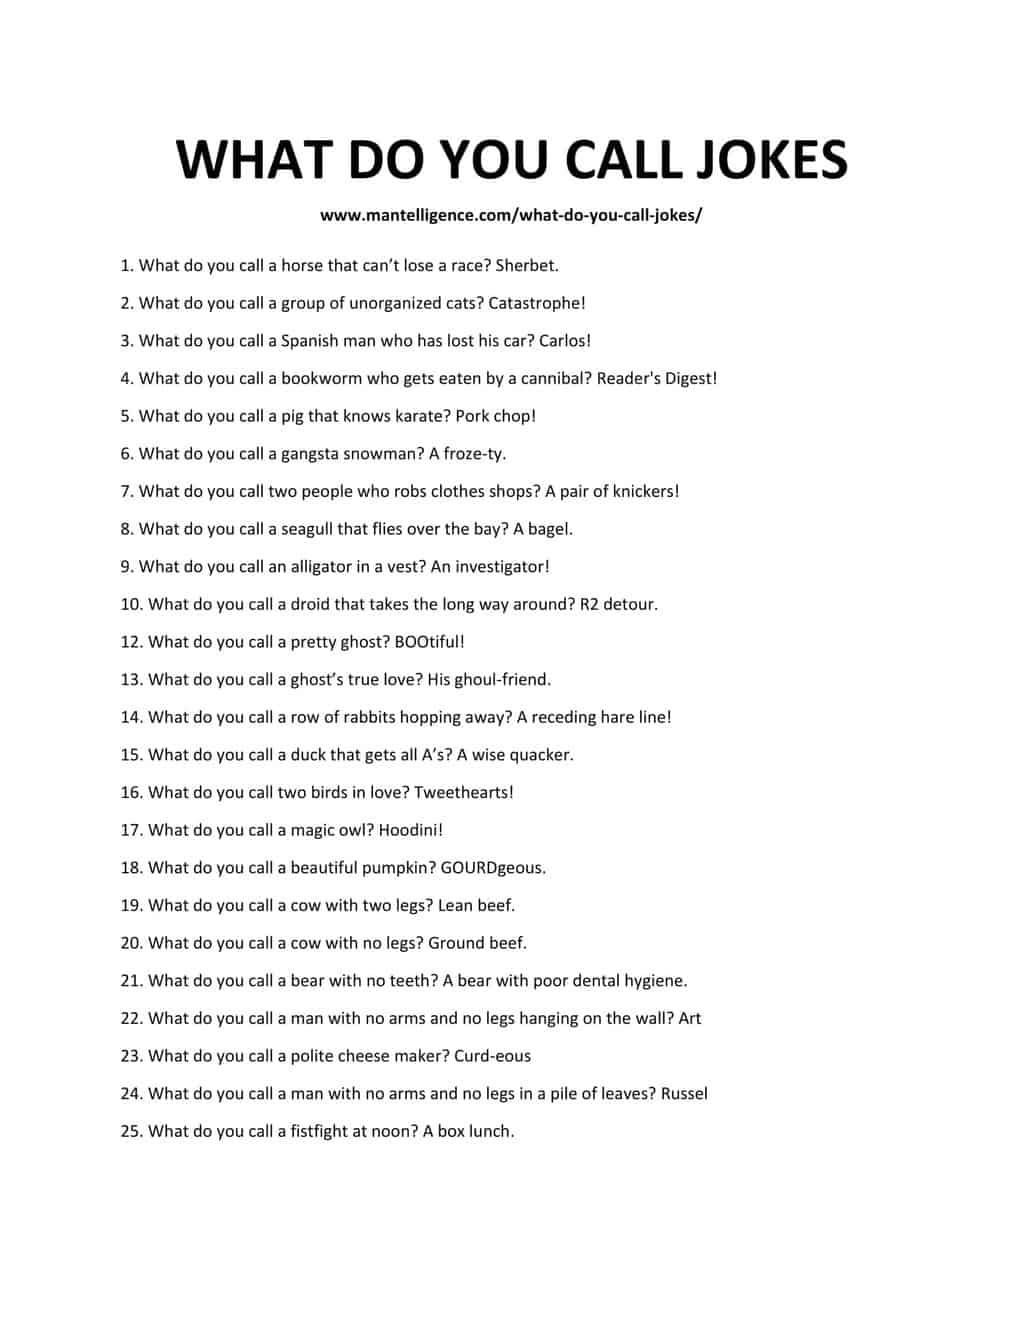 WHAT_DO_YOU_CALL_JOKES-1[1]